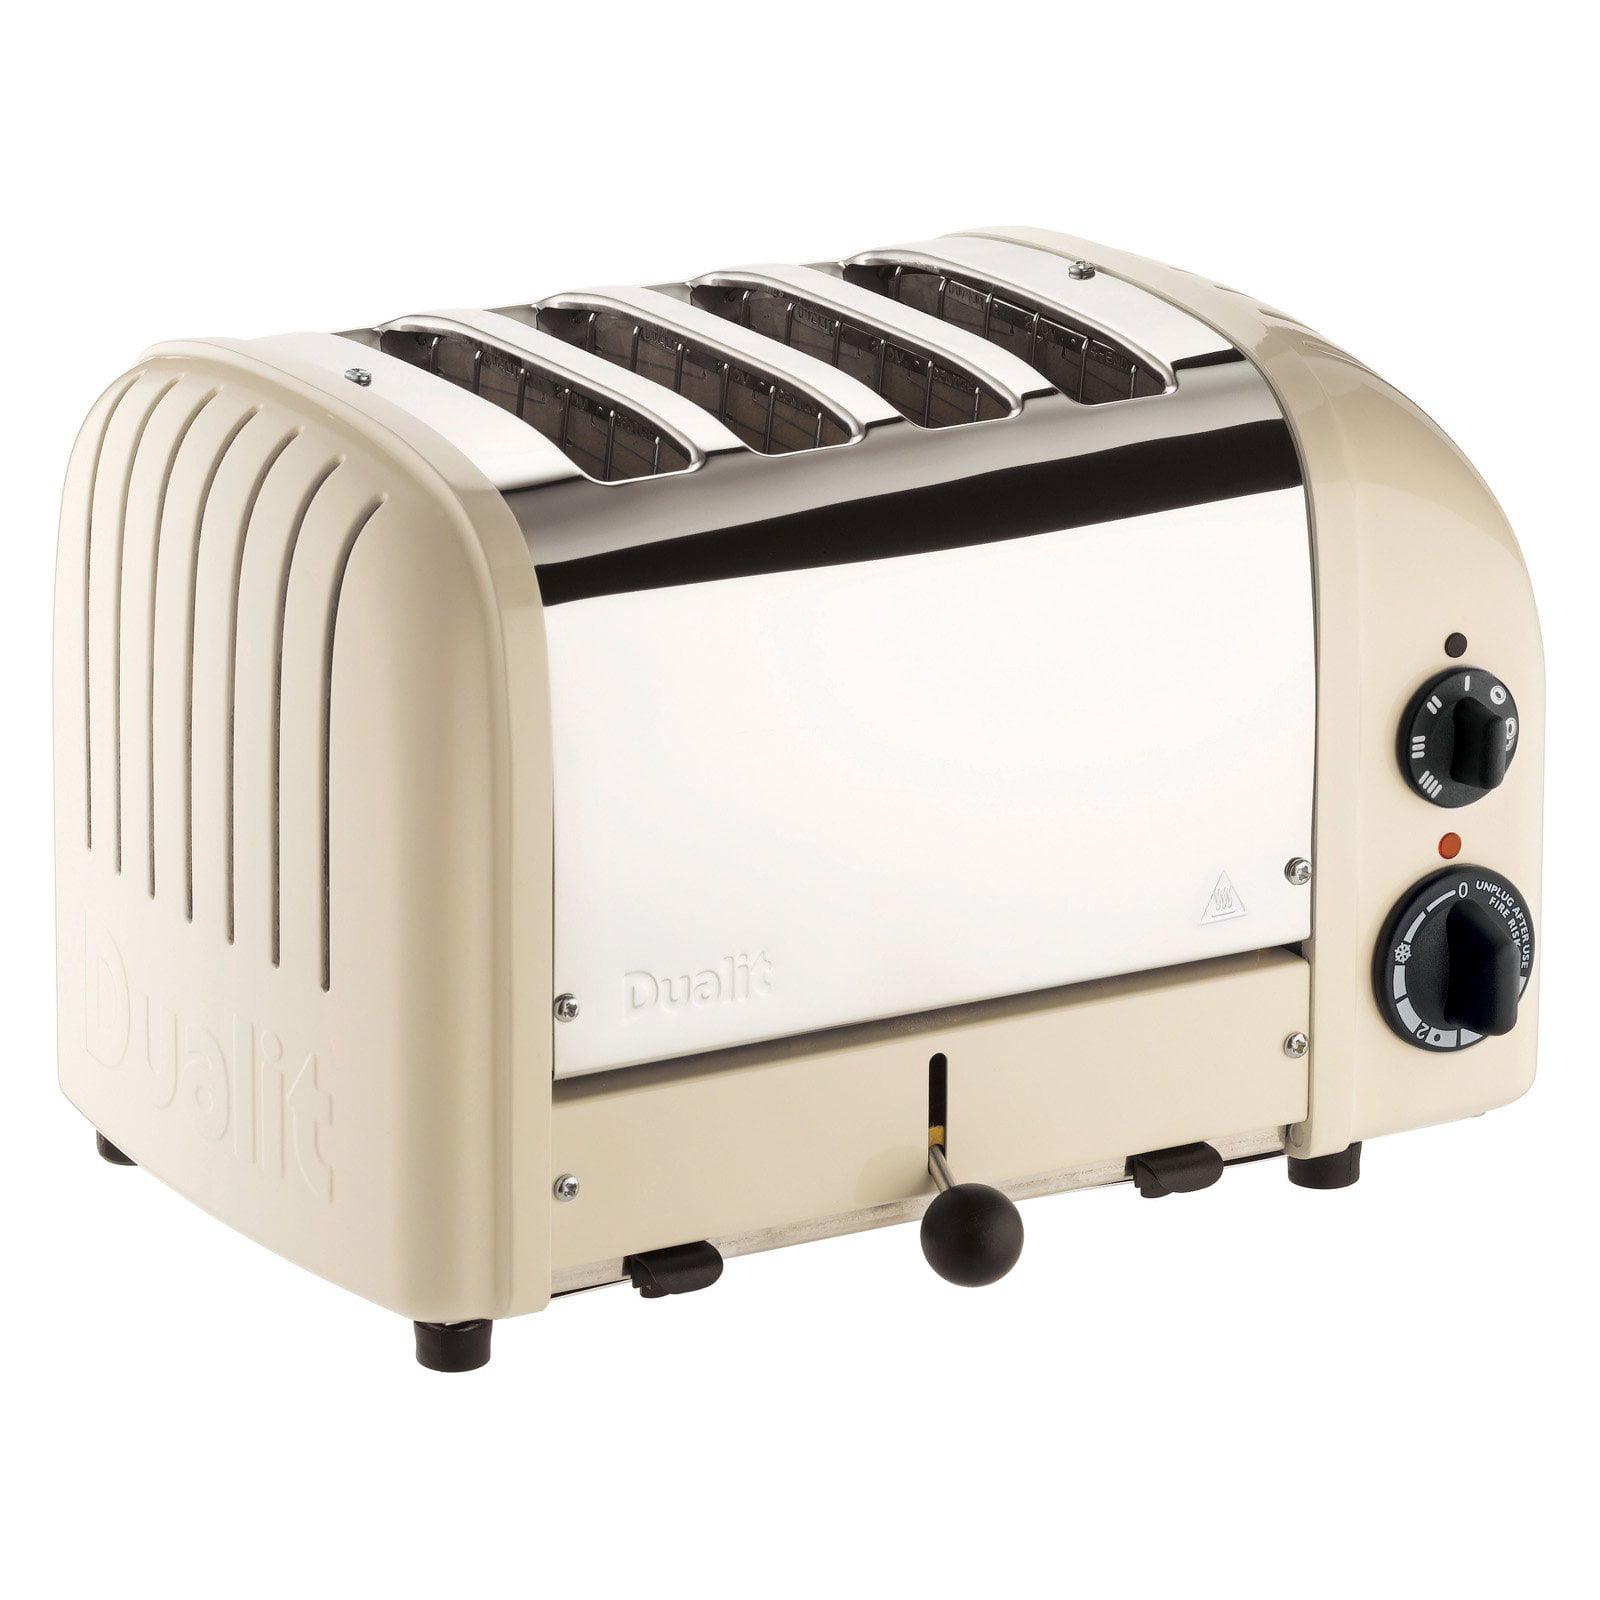 Dualit 47152 4 Slice NewGen Toaster - Utility Cream